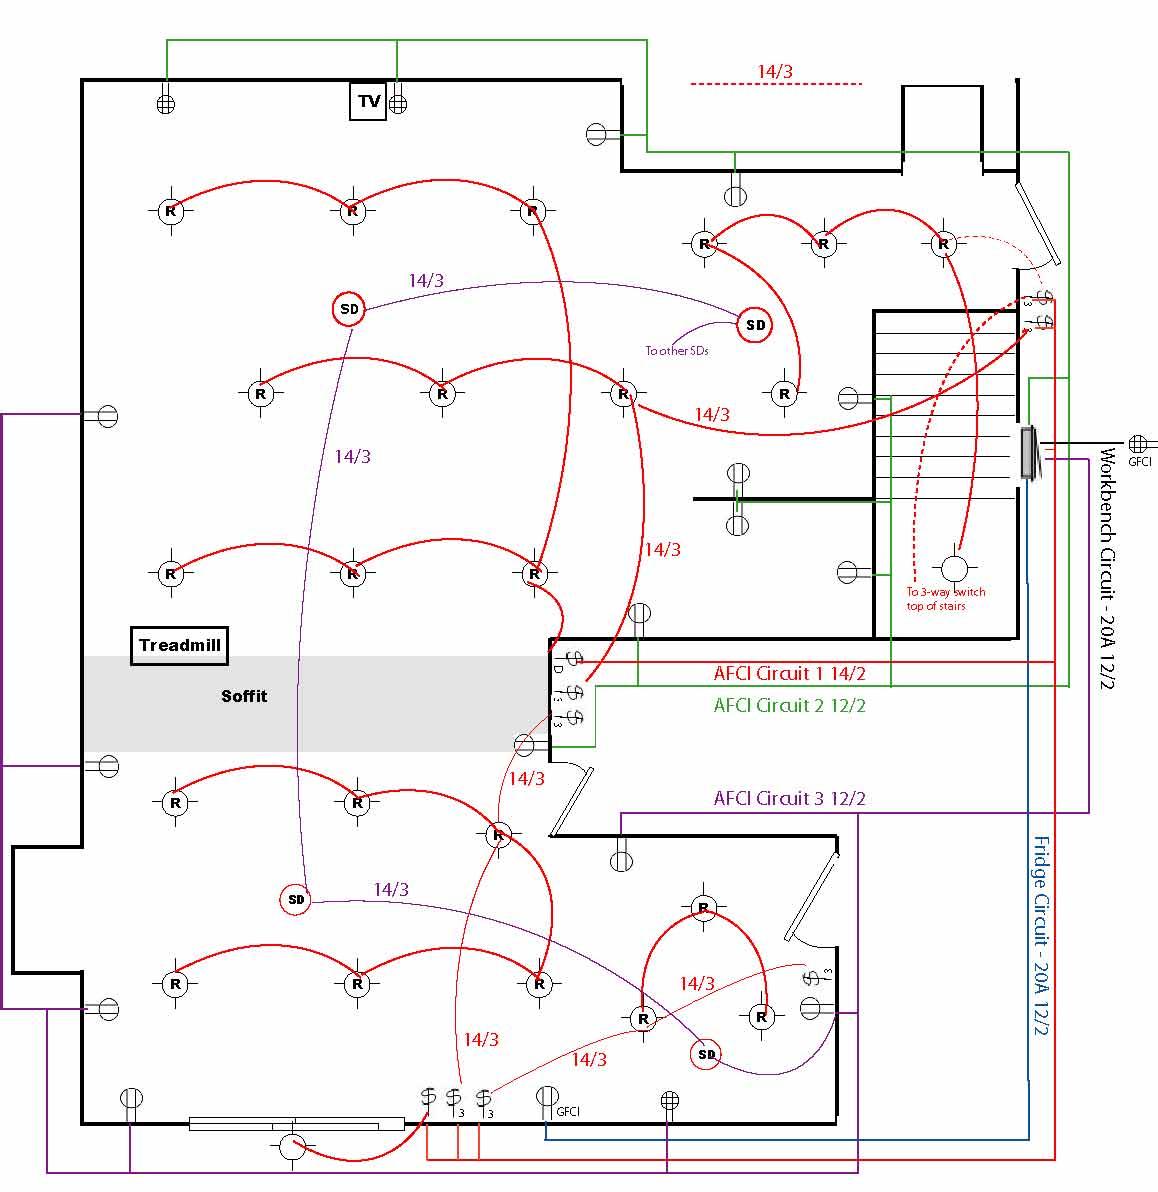 Basement wiring diagram for 60A service/ 600sf-basement_v2.jpg